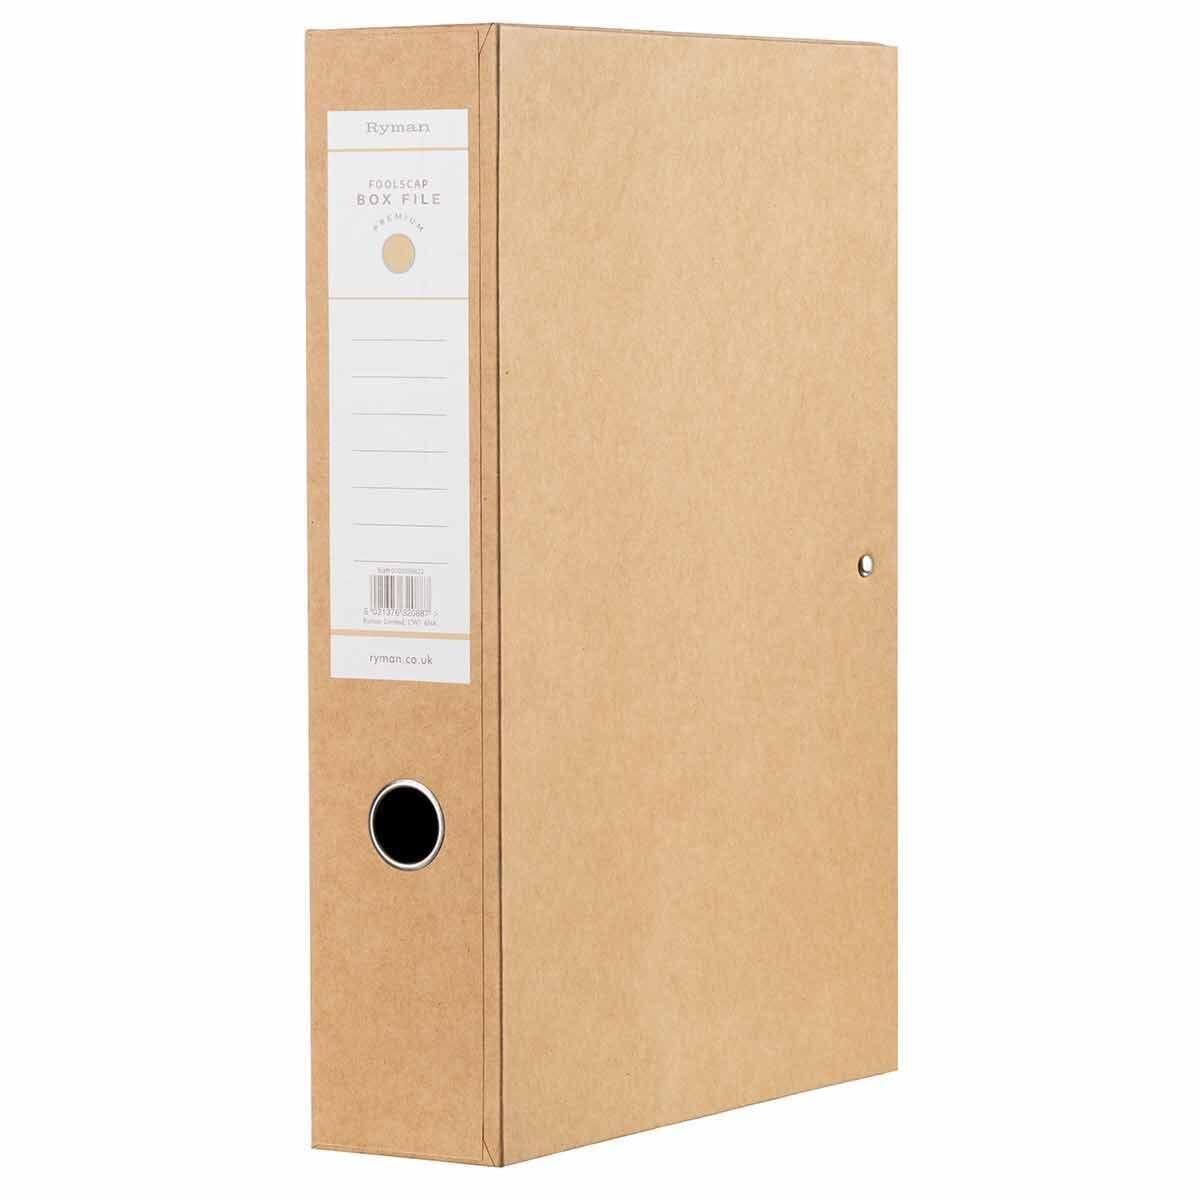 Ryman Kraft Box File Foolscap Pack of 5